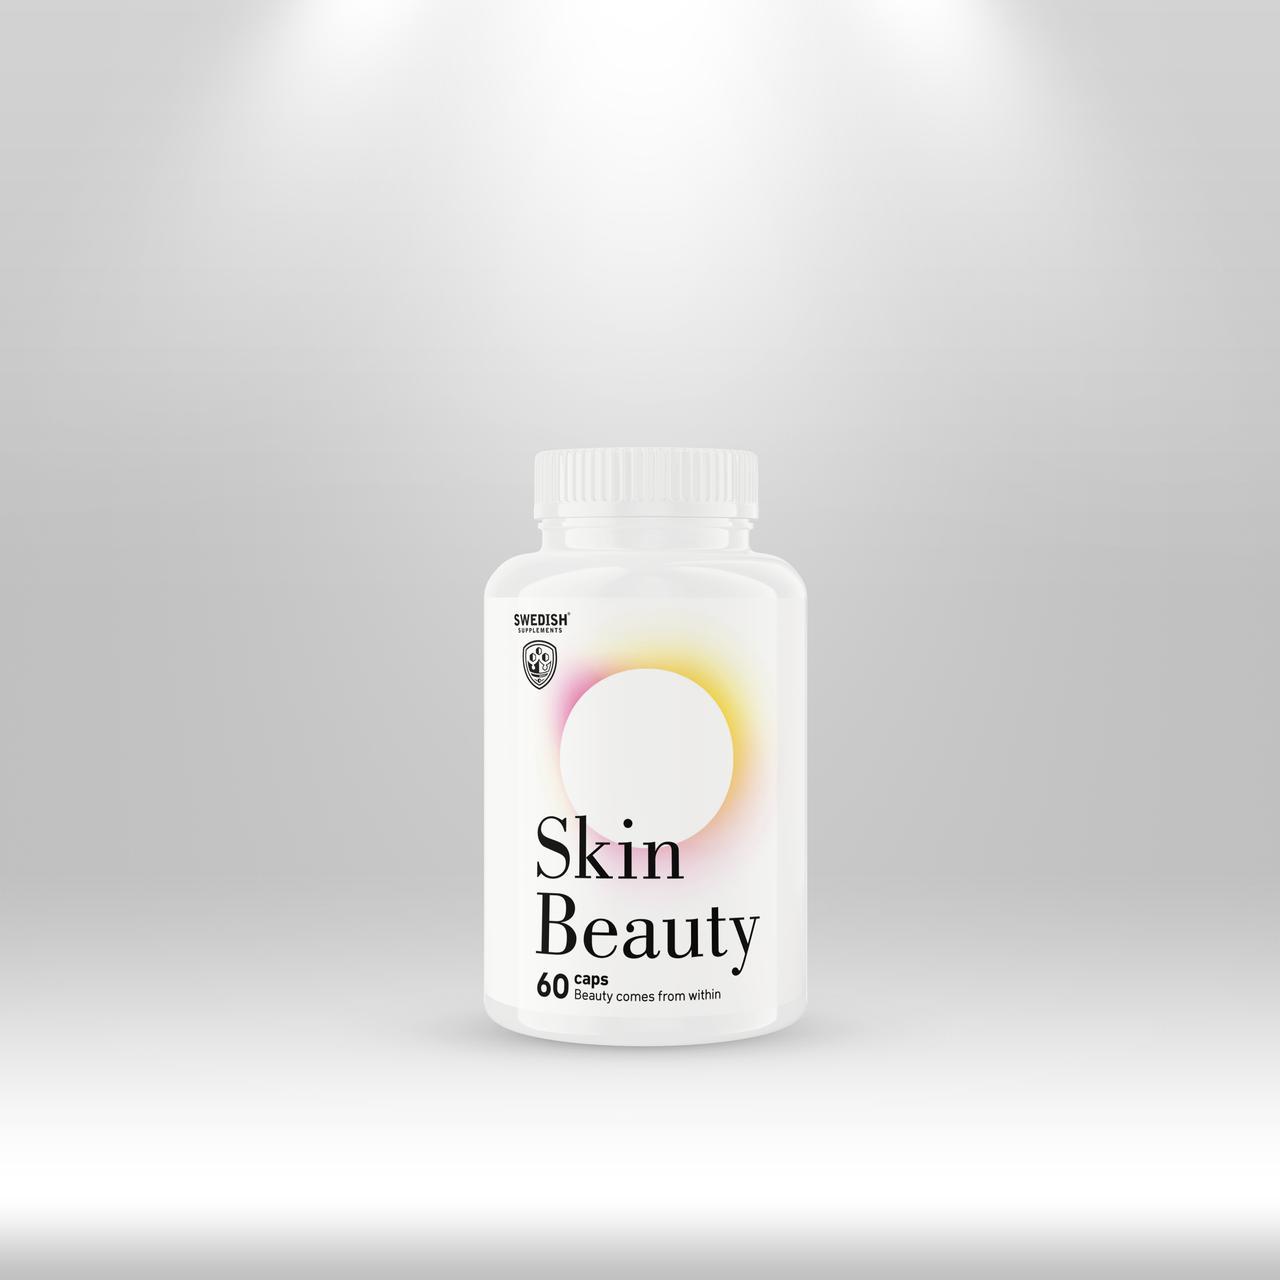 Swedish Supplements Skin Beauty, 60 caps